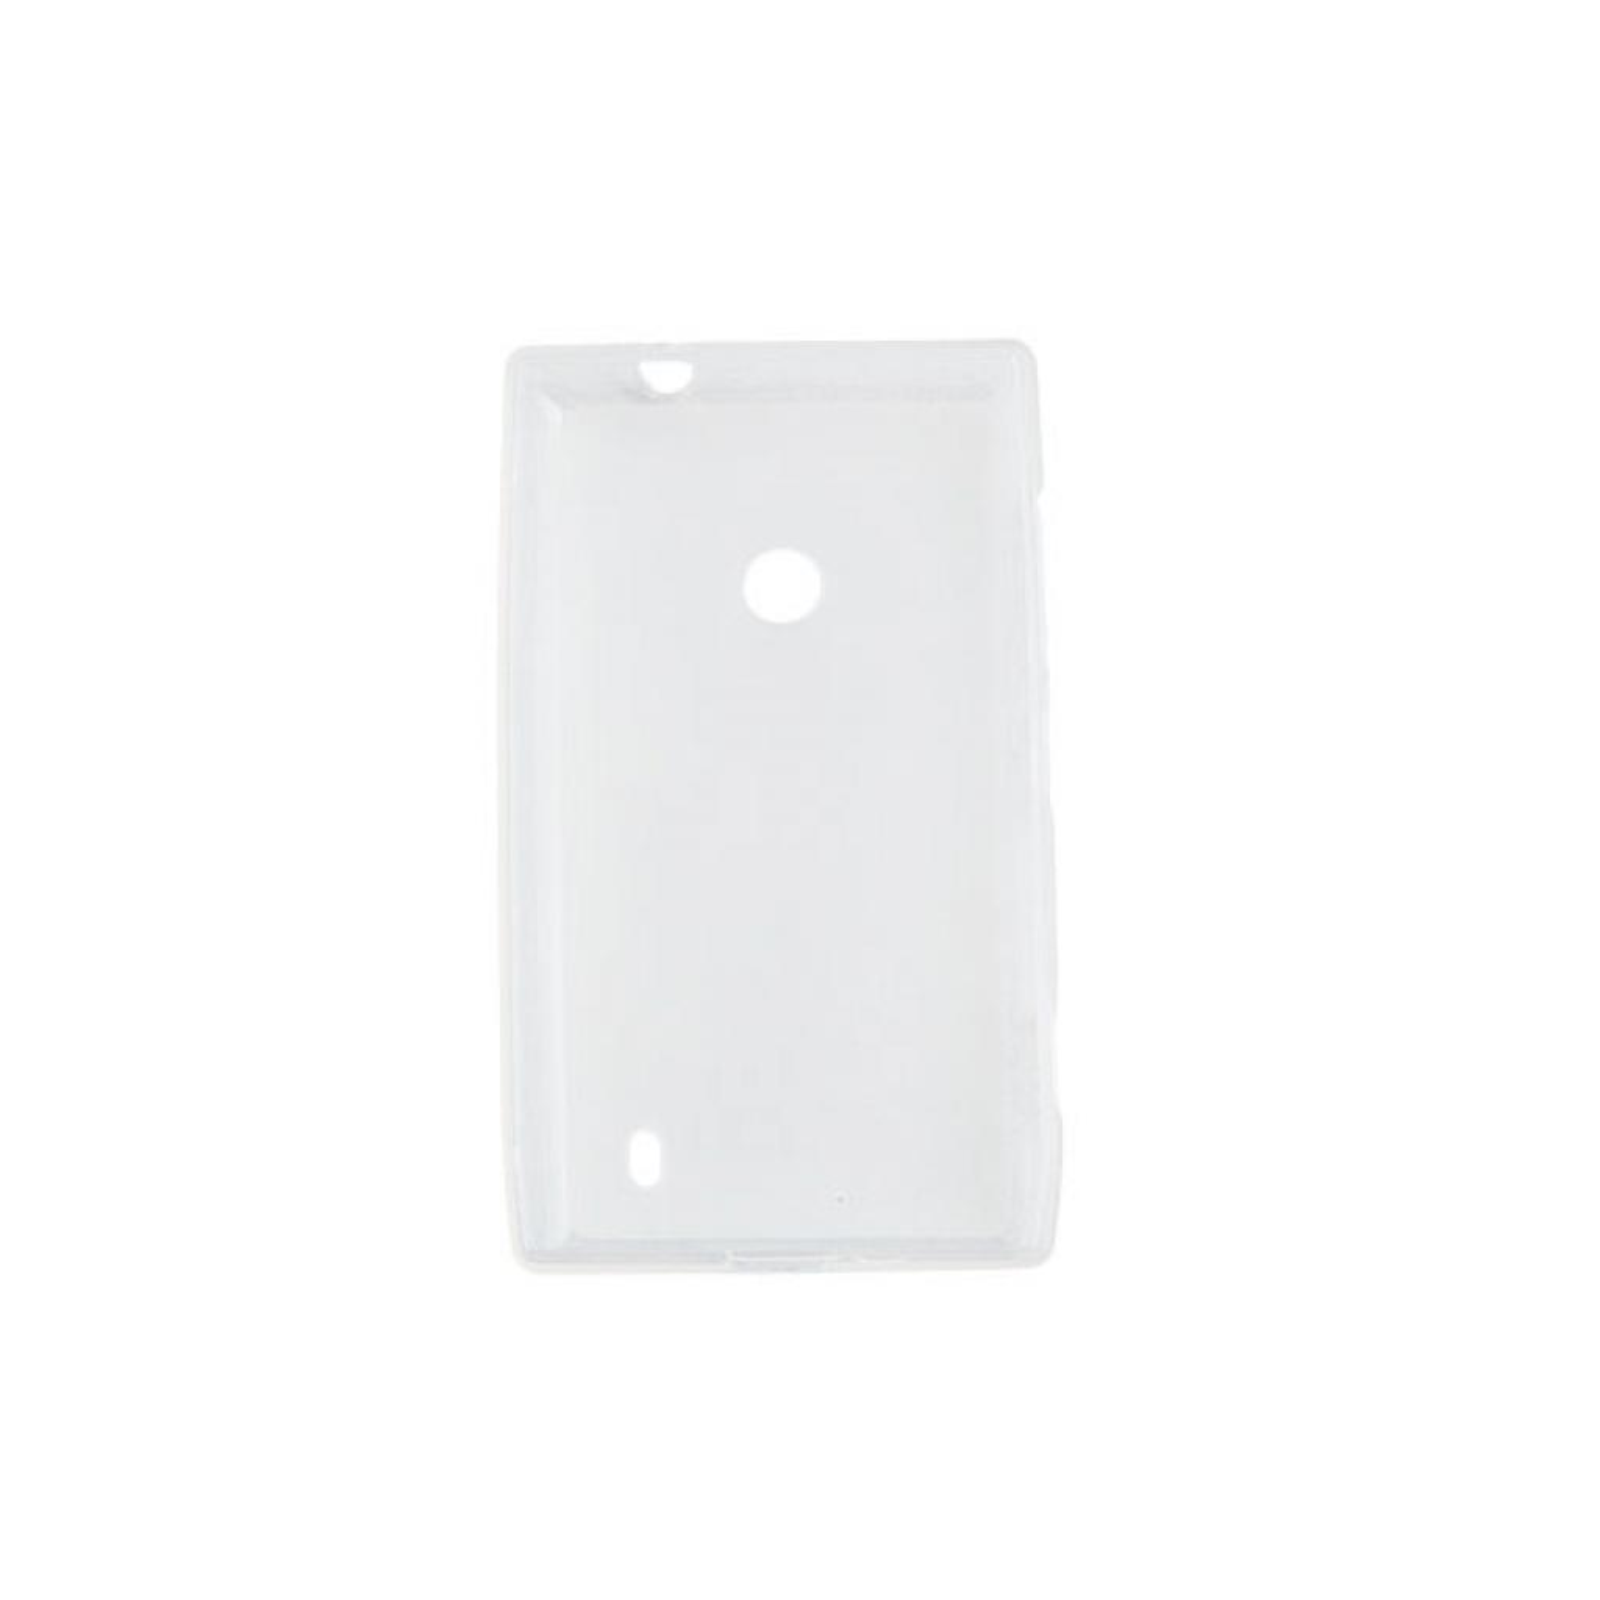 Чехол для моб. телефона для Nokia Lumia 525 (White Clear) Elastic PU Drobak (216397) изображение 2